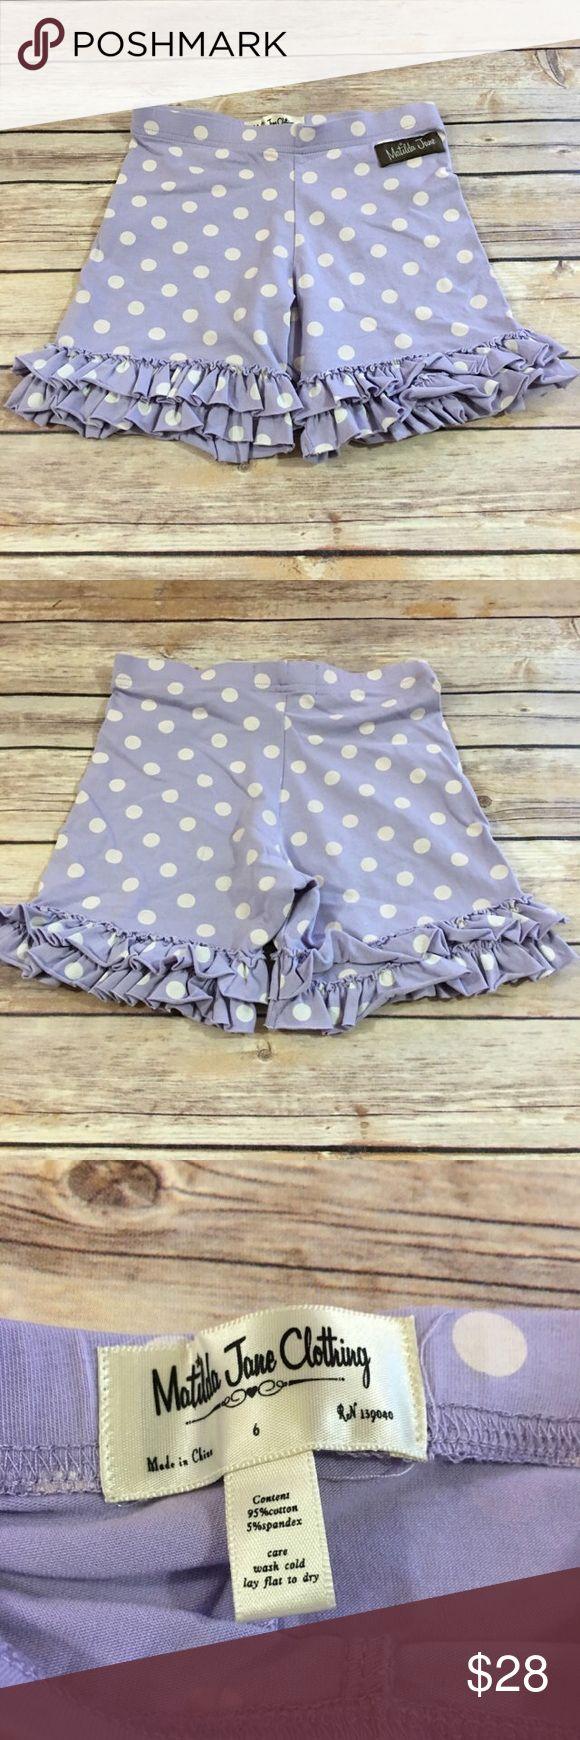 Matilda Jane Good Hart Shortline Shorties 6 Matilda Jane Good Hart Shortline Shorties 6  Great condition.  So cute.  Match the watercolor top I have listed.  #goodhart #mjgoodhart #mjaddicts #shorts #shorties #shortstuff #ruffles #polkadot #lavender #polkadots #mjshorties Matilda Jane Bottoms Shorts